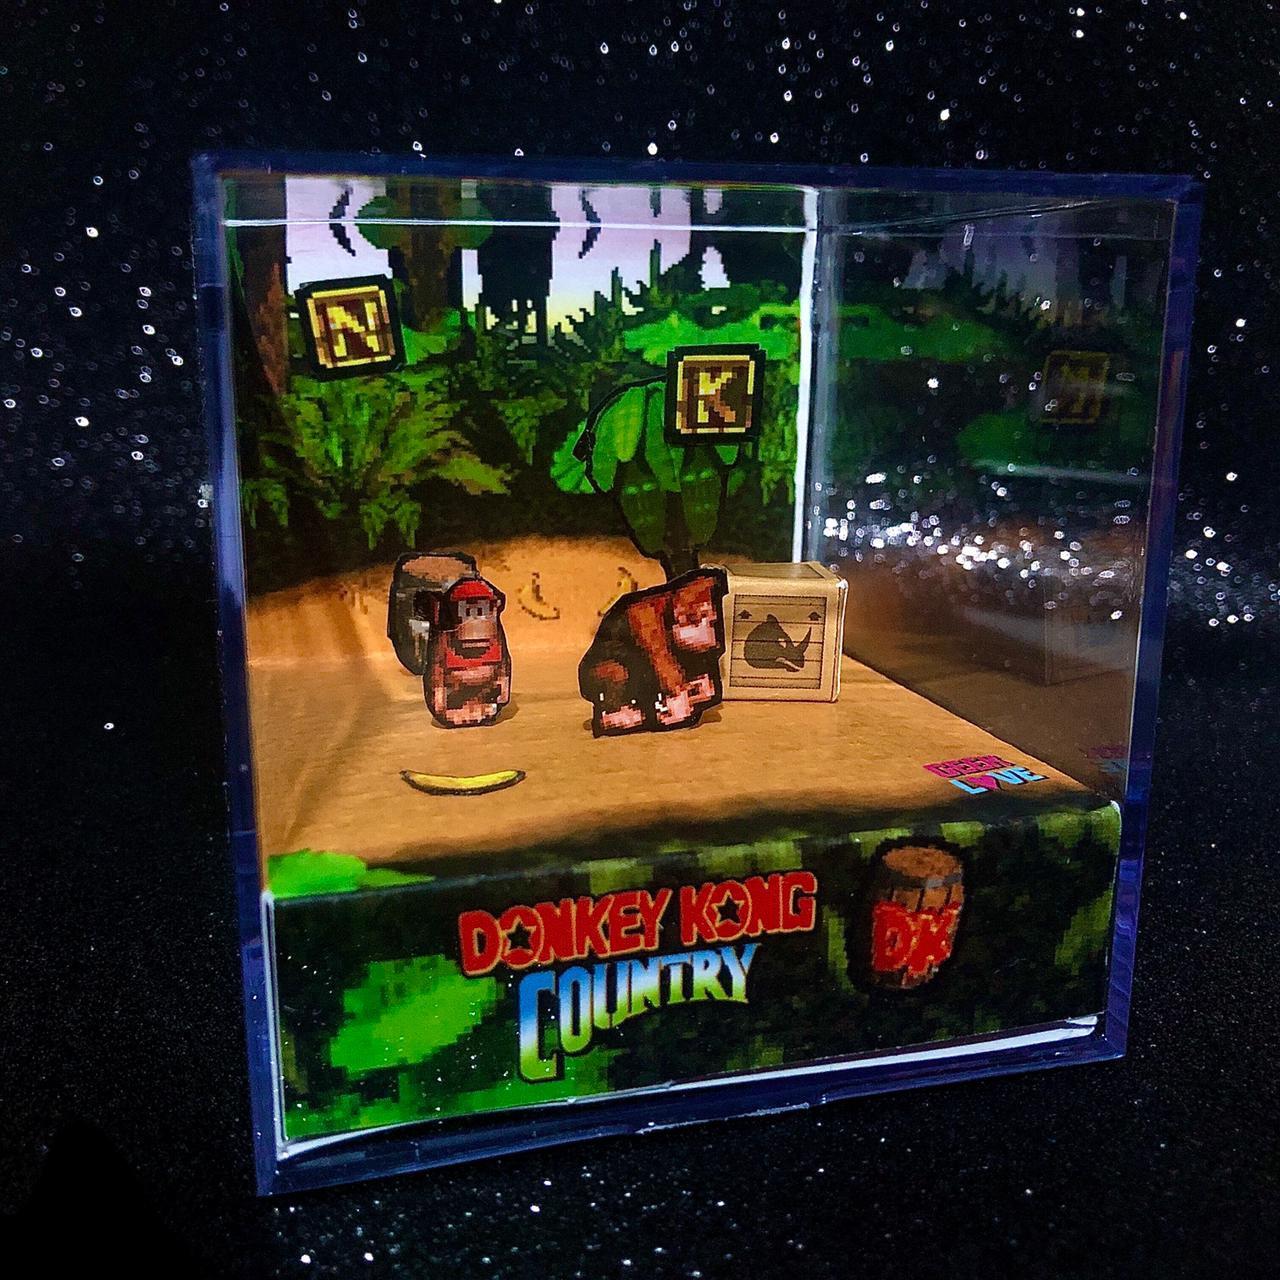 Geek Love Cubo - Donkey Kong Country